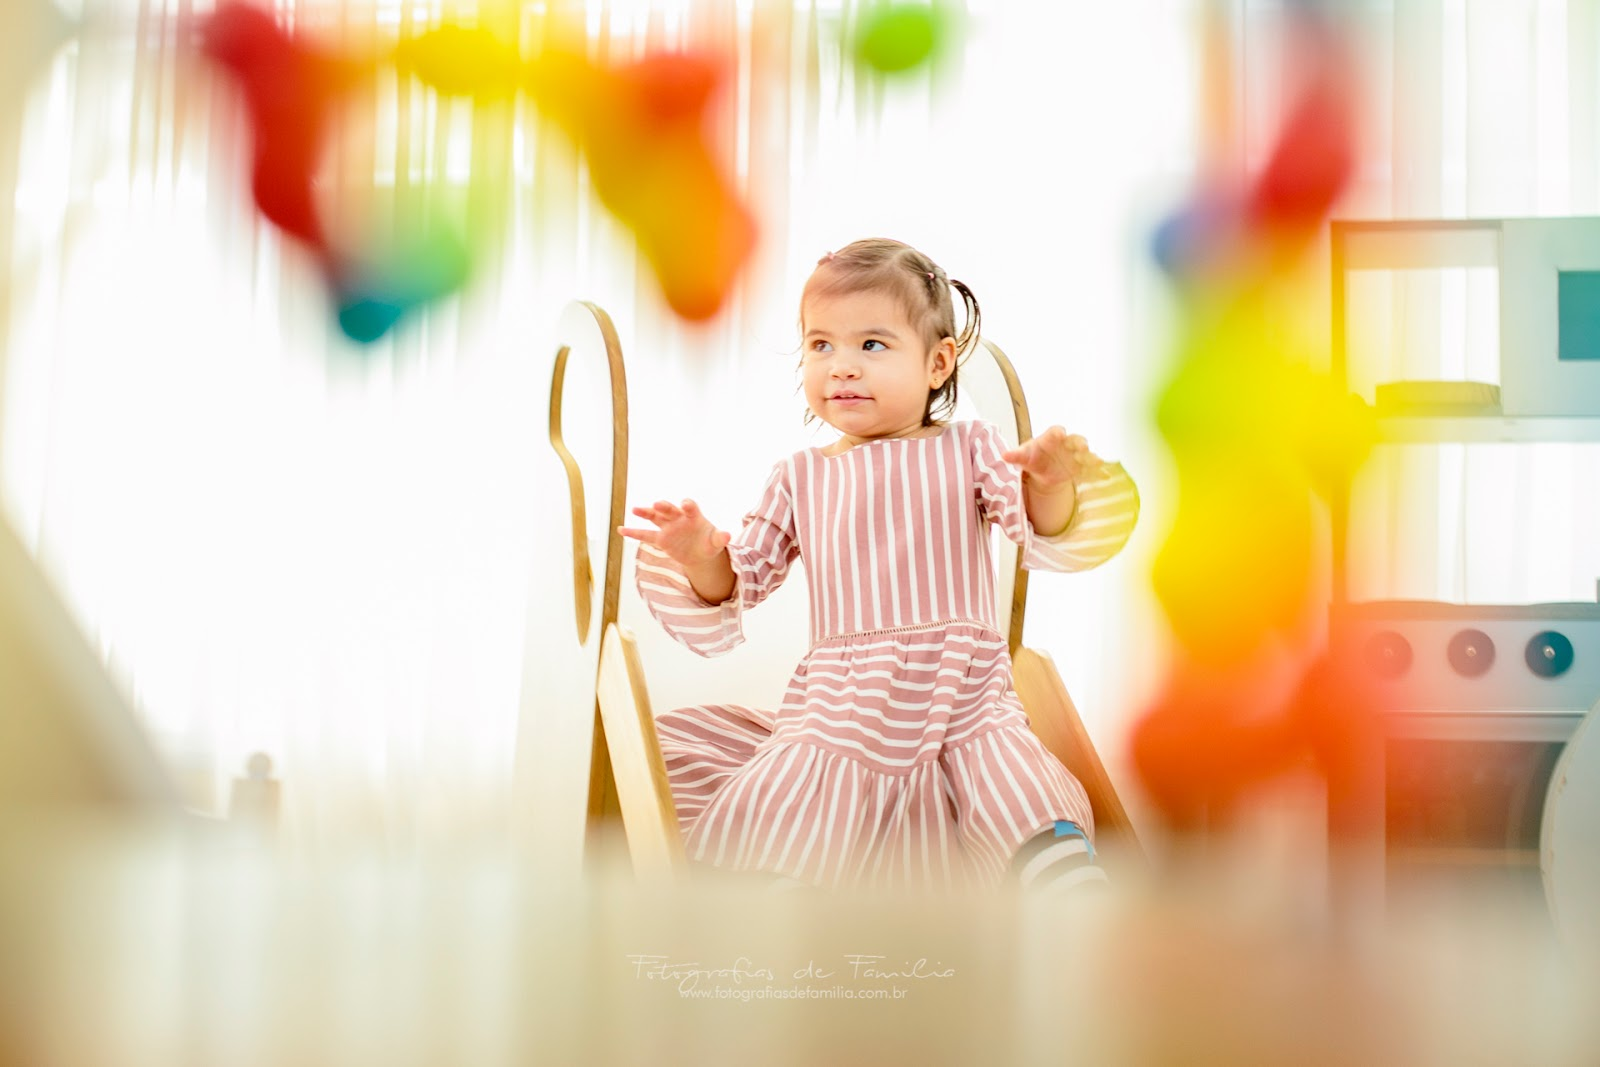 fotografo festa infantil e familia